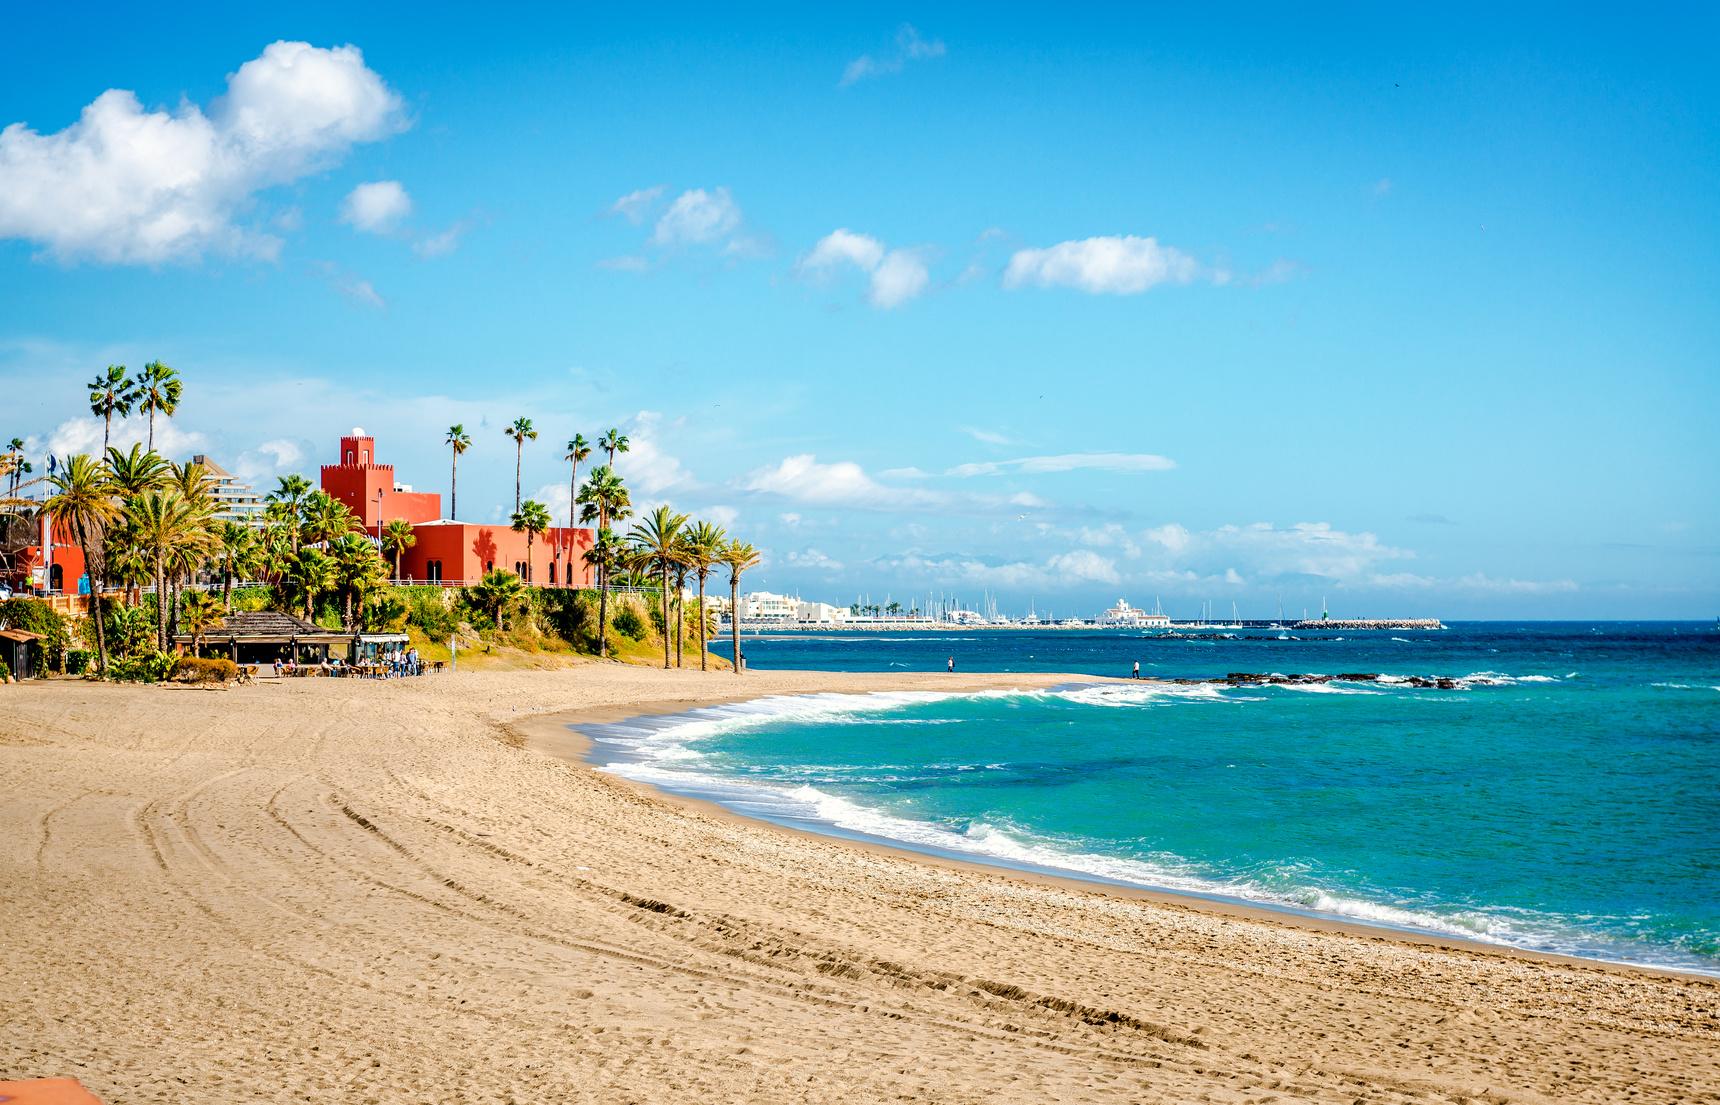 Wczasy na Costa del Sol!